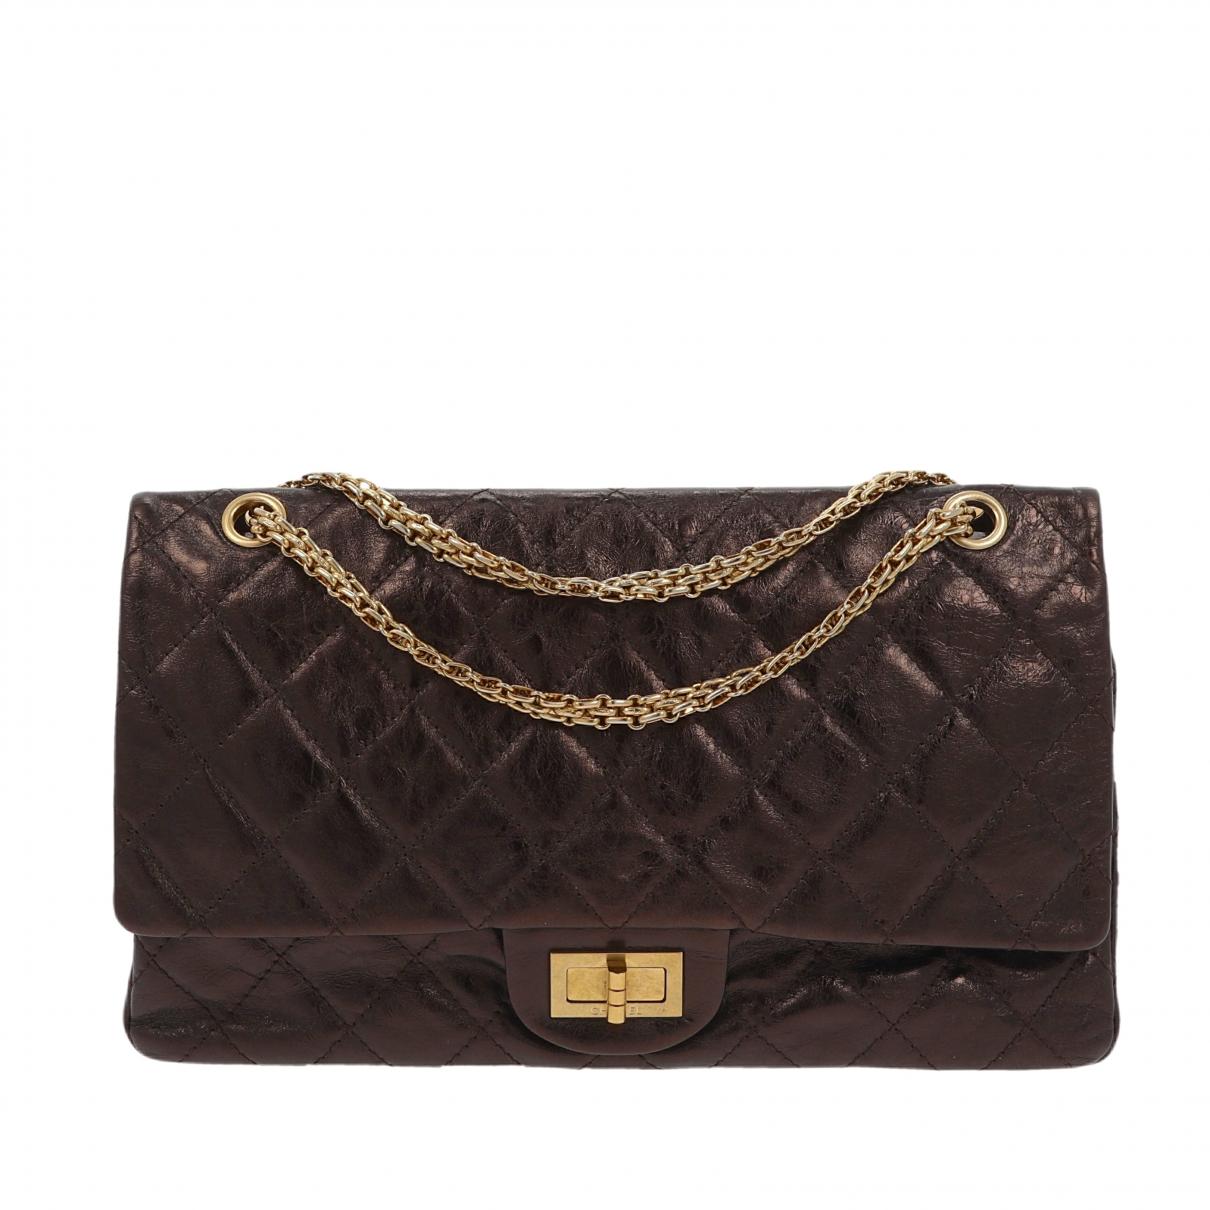 Chanel - Sac a main 2.55 pour femme en cuir - metallise